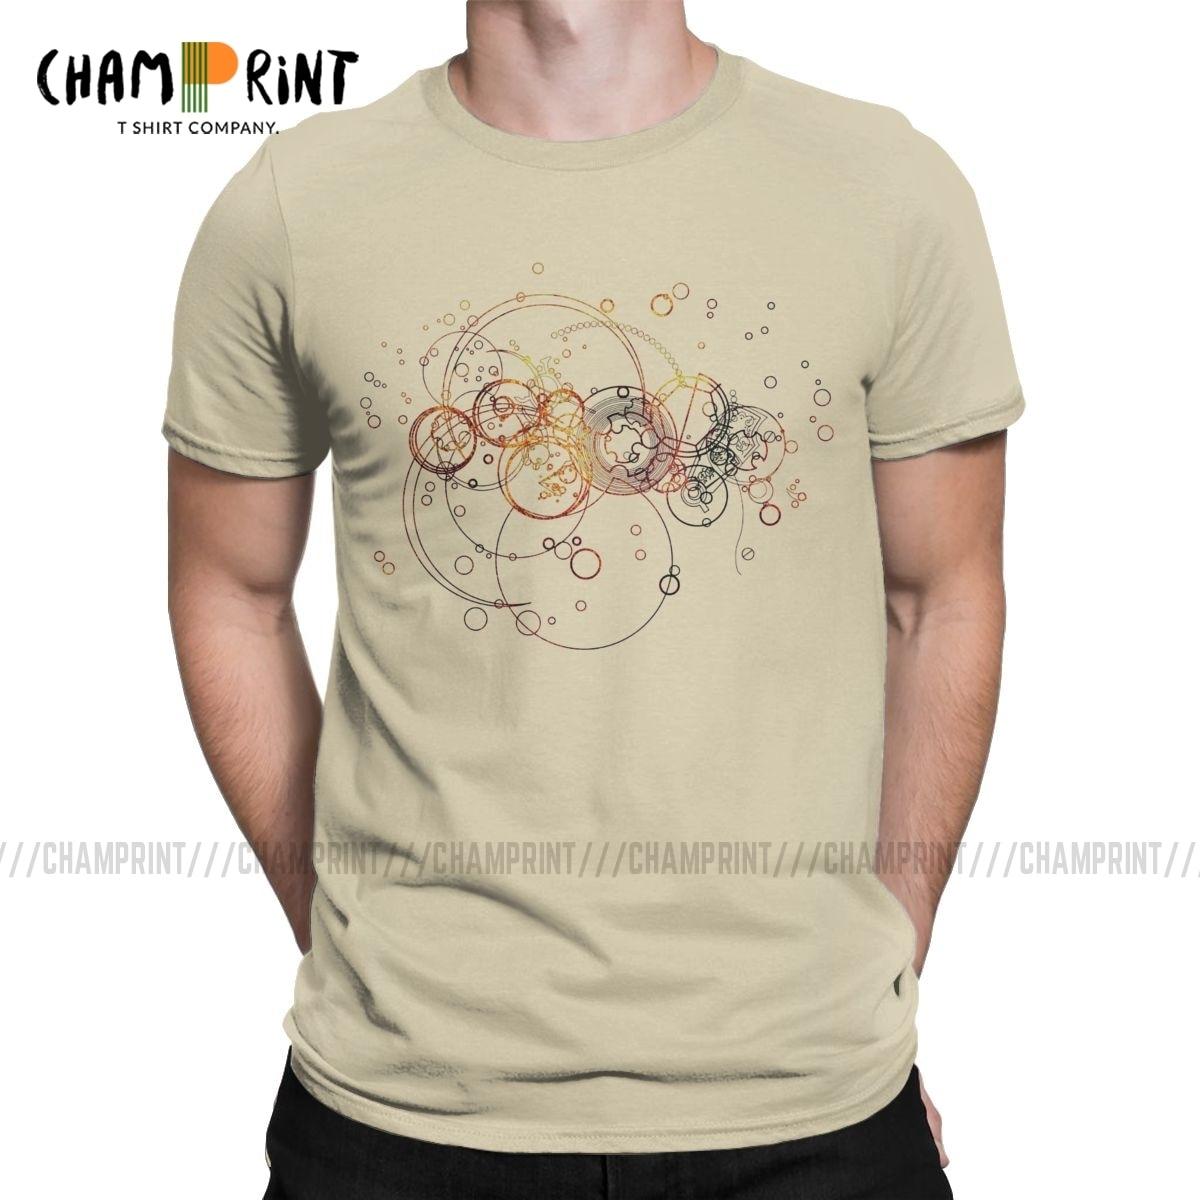 Time Lord Writing T Shirt Men's Cotton 2019 Fashion T-Shirts Mandala Sacred Religious Geometry Tees Short Sleeve Clothes